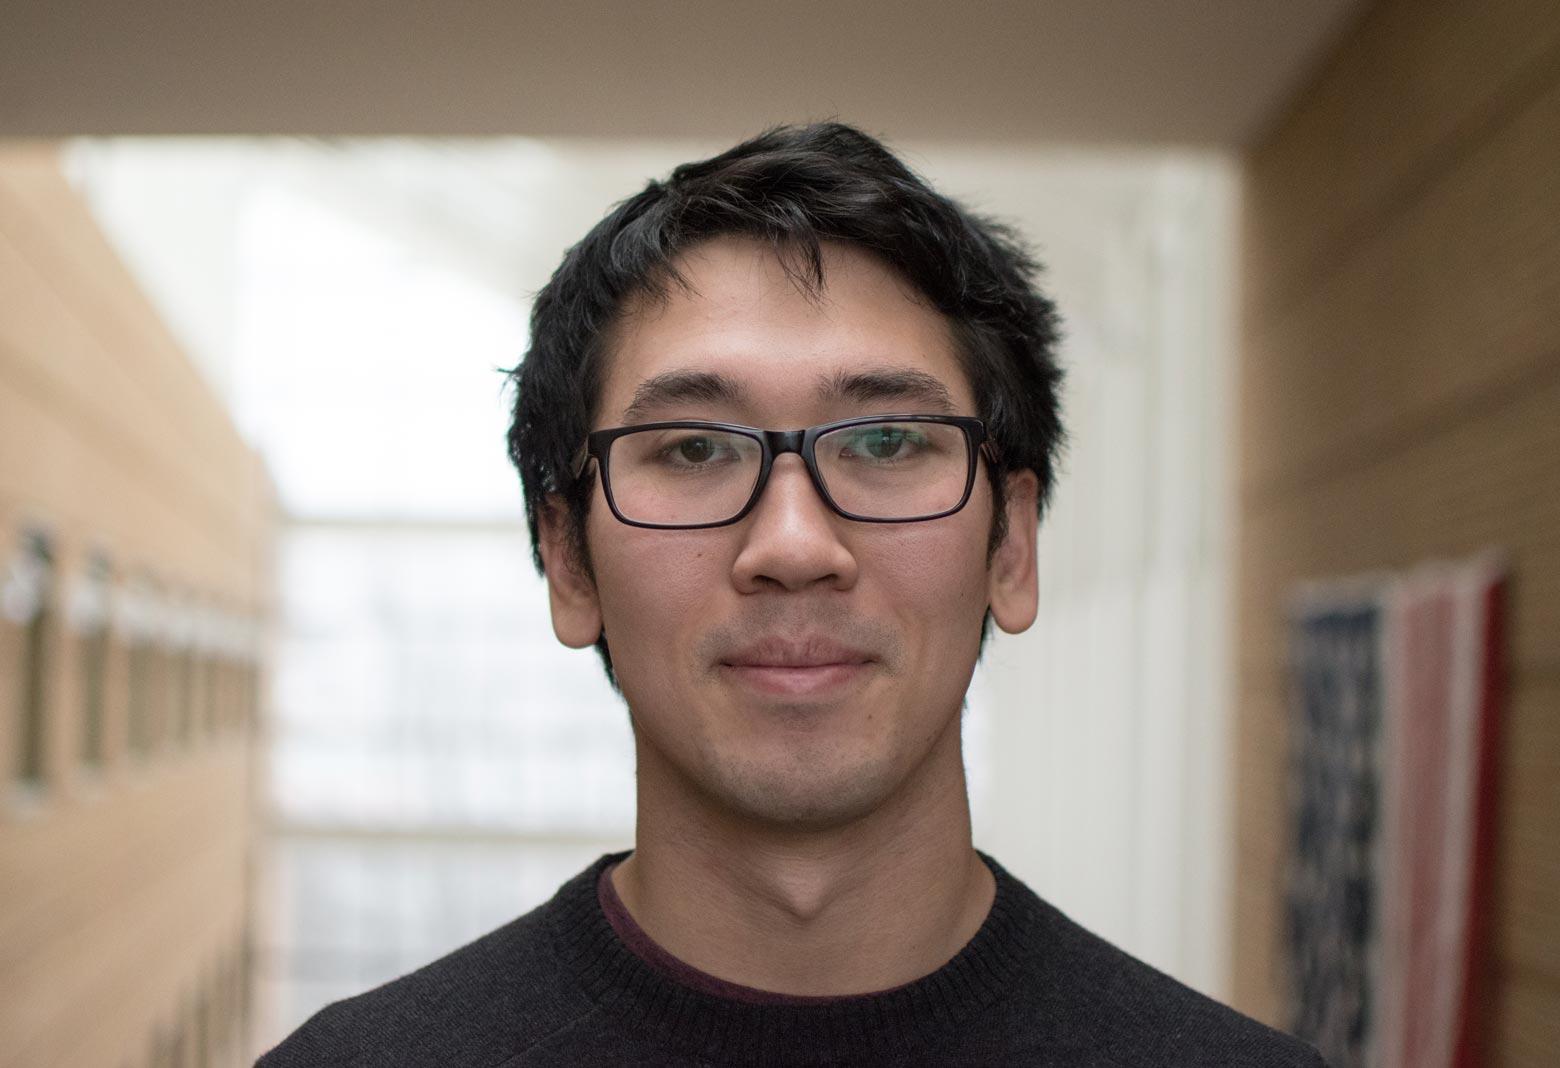 Dominic Liao-McPherson